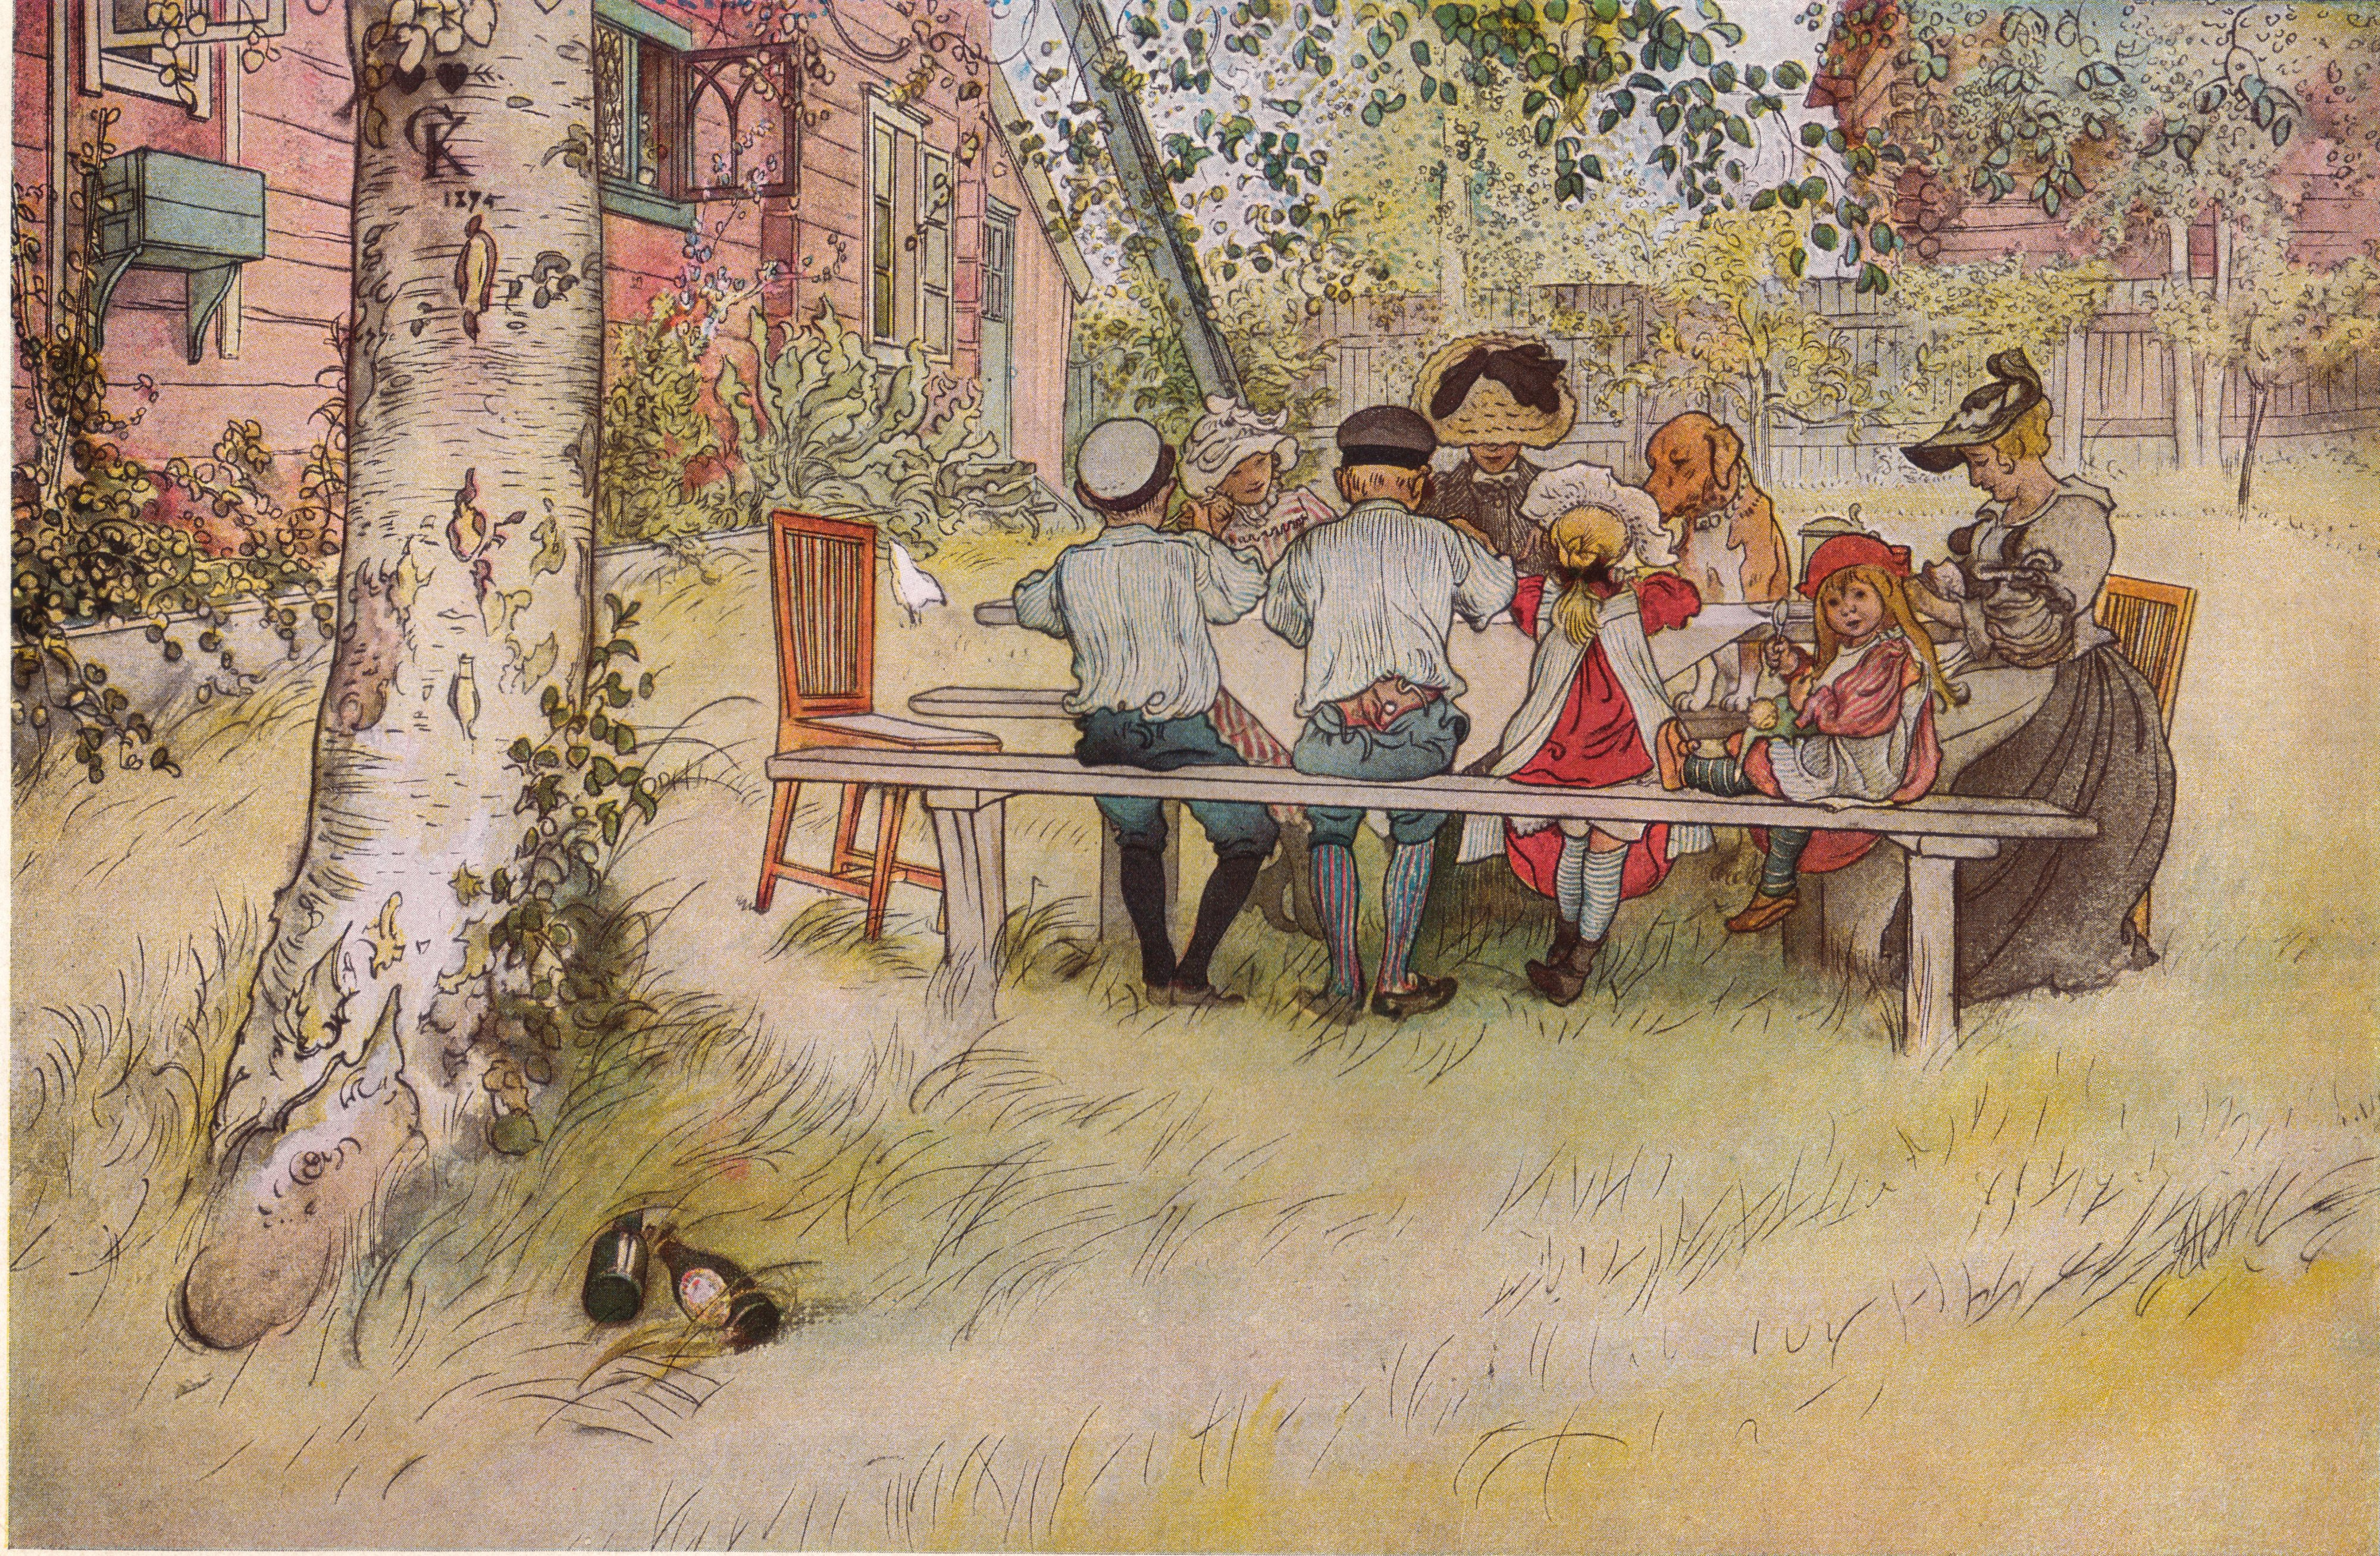 Frukost under stora björken av Carl Larsson 1896.jpg